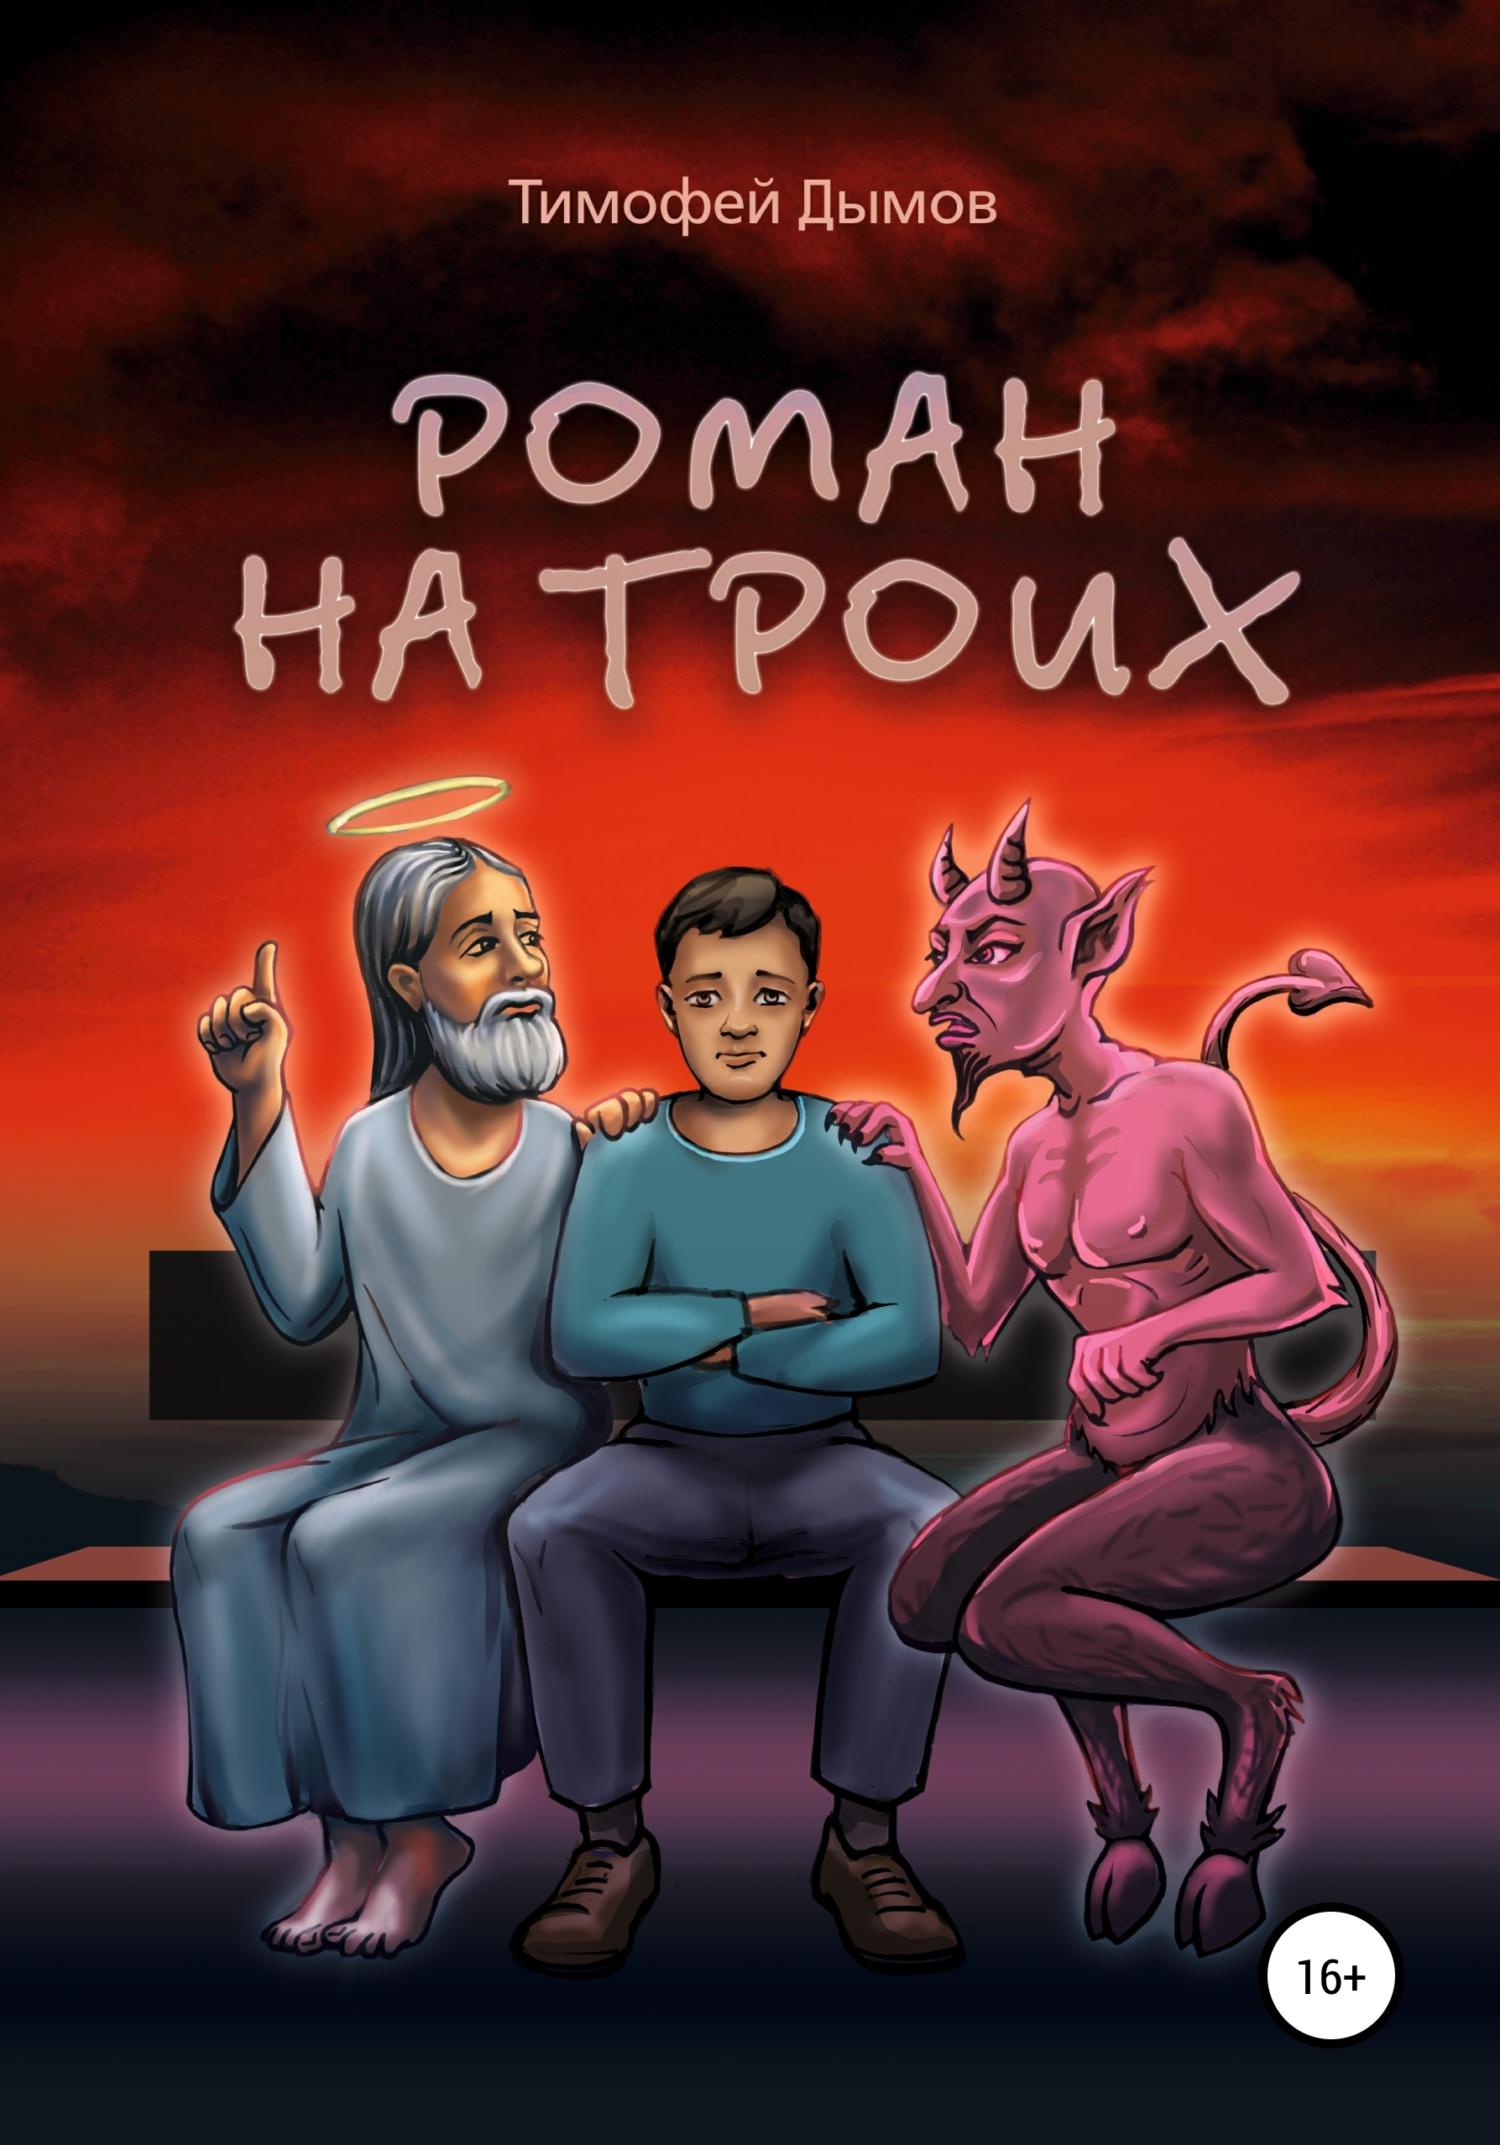 цена на Тимофей Дымов Роман на троих